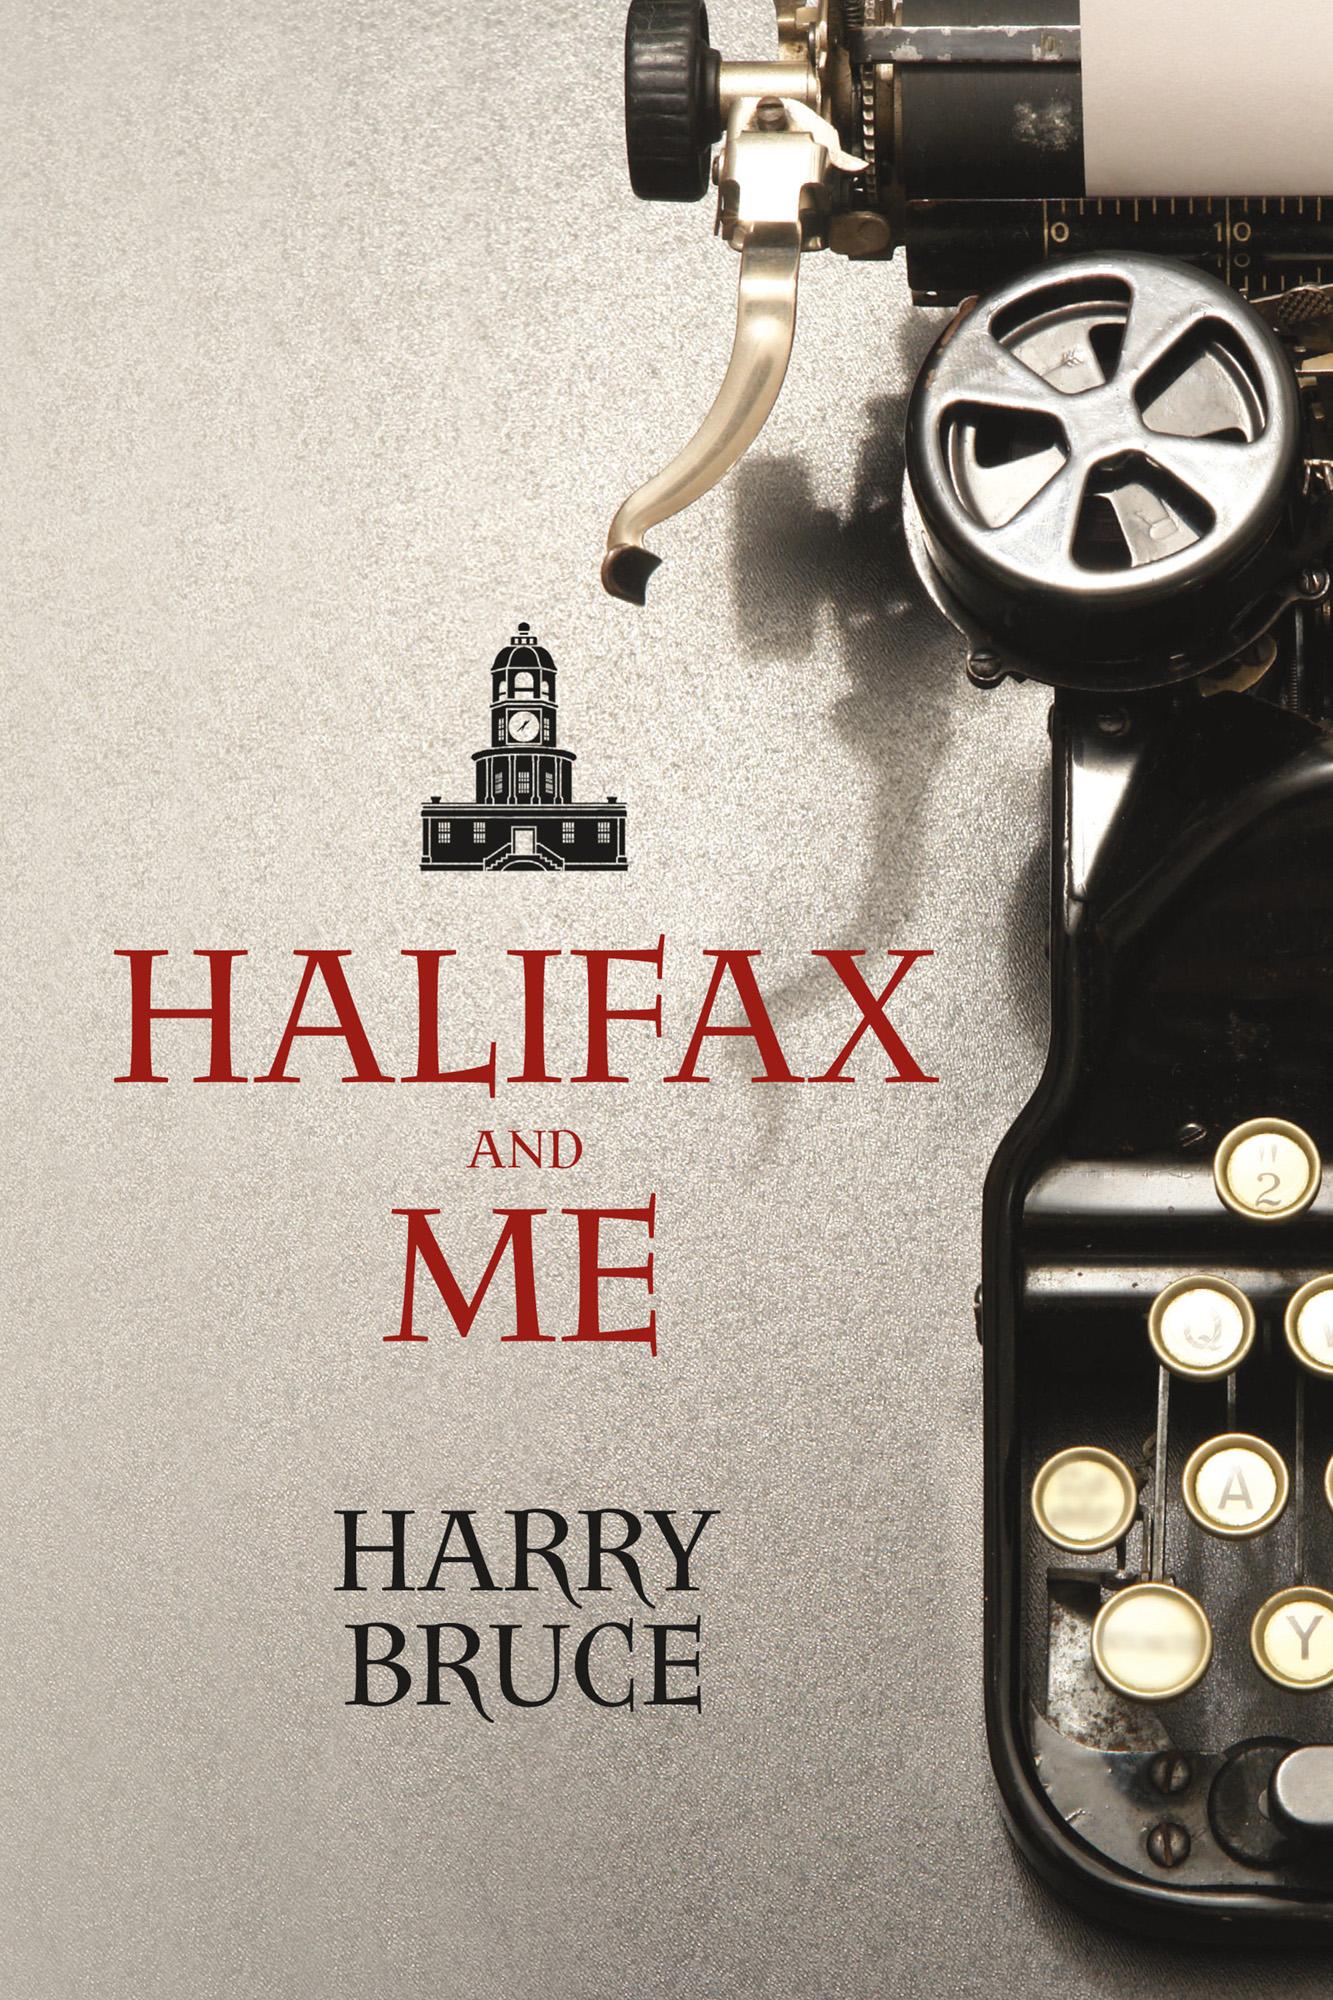 Halifax and Me